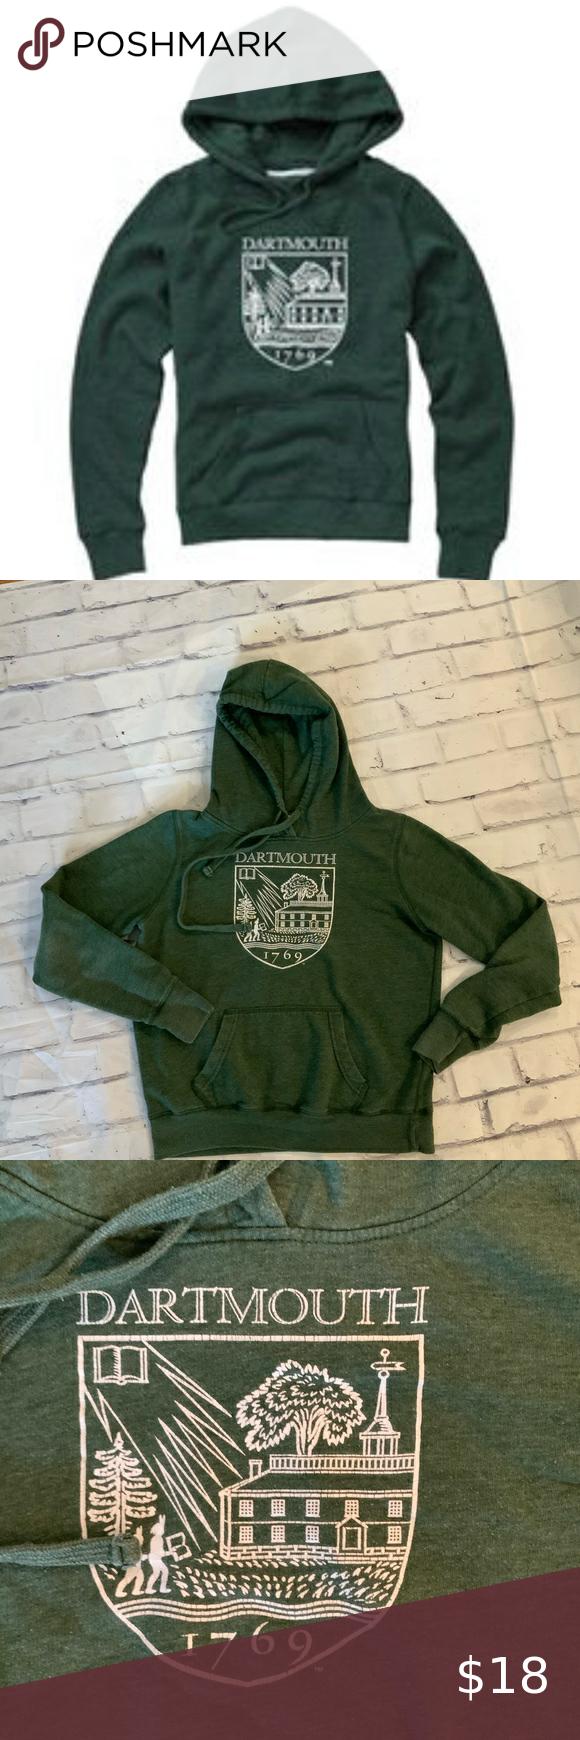 Dartmouth Green Hoodie In 2021 Green Hoodie Sweatshirt Tops Brushed Cotton Jacket [ 1740 x 580 Pixel ]